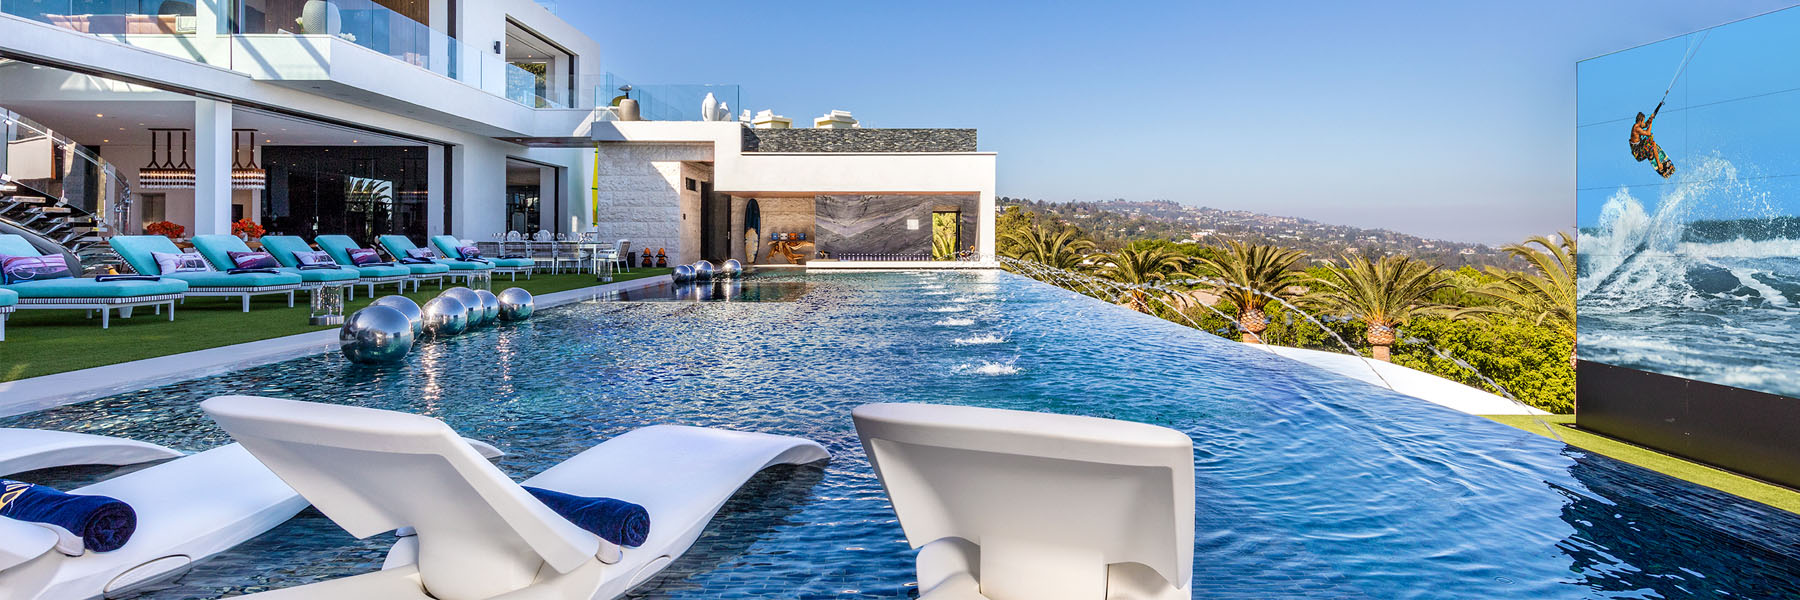 Modern Billionaire Luxury Home 924 Bel Air Road12